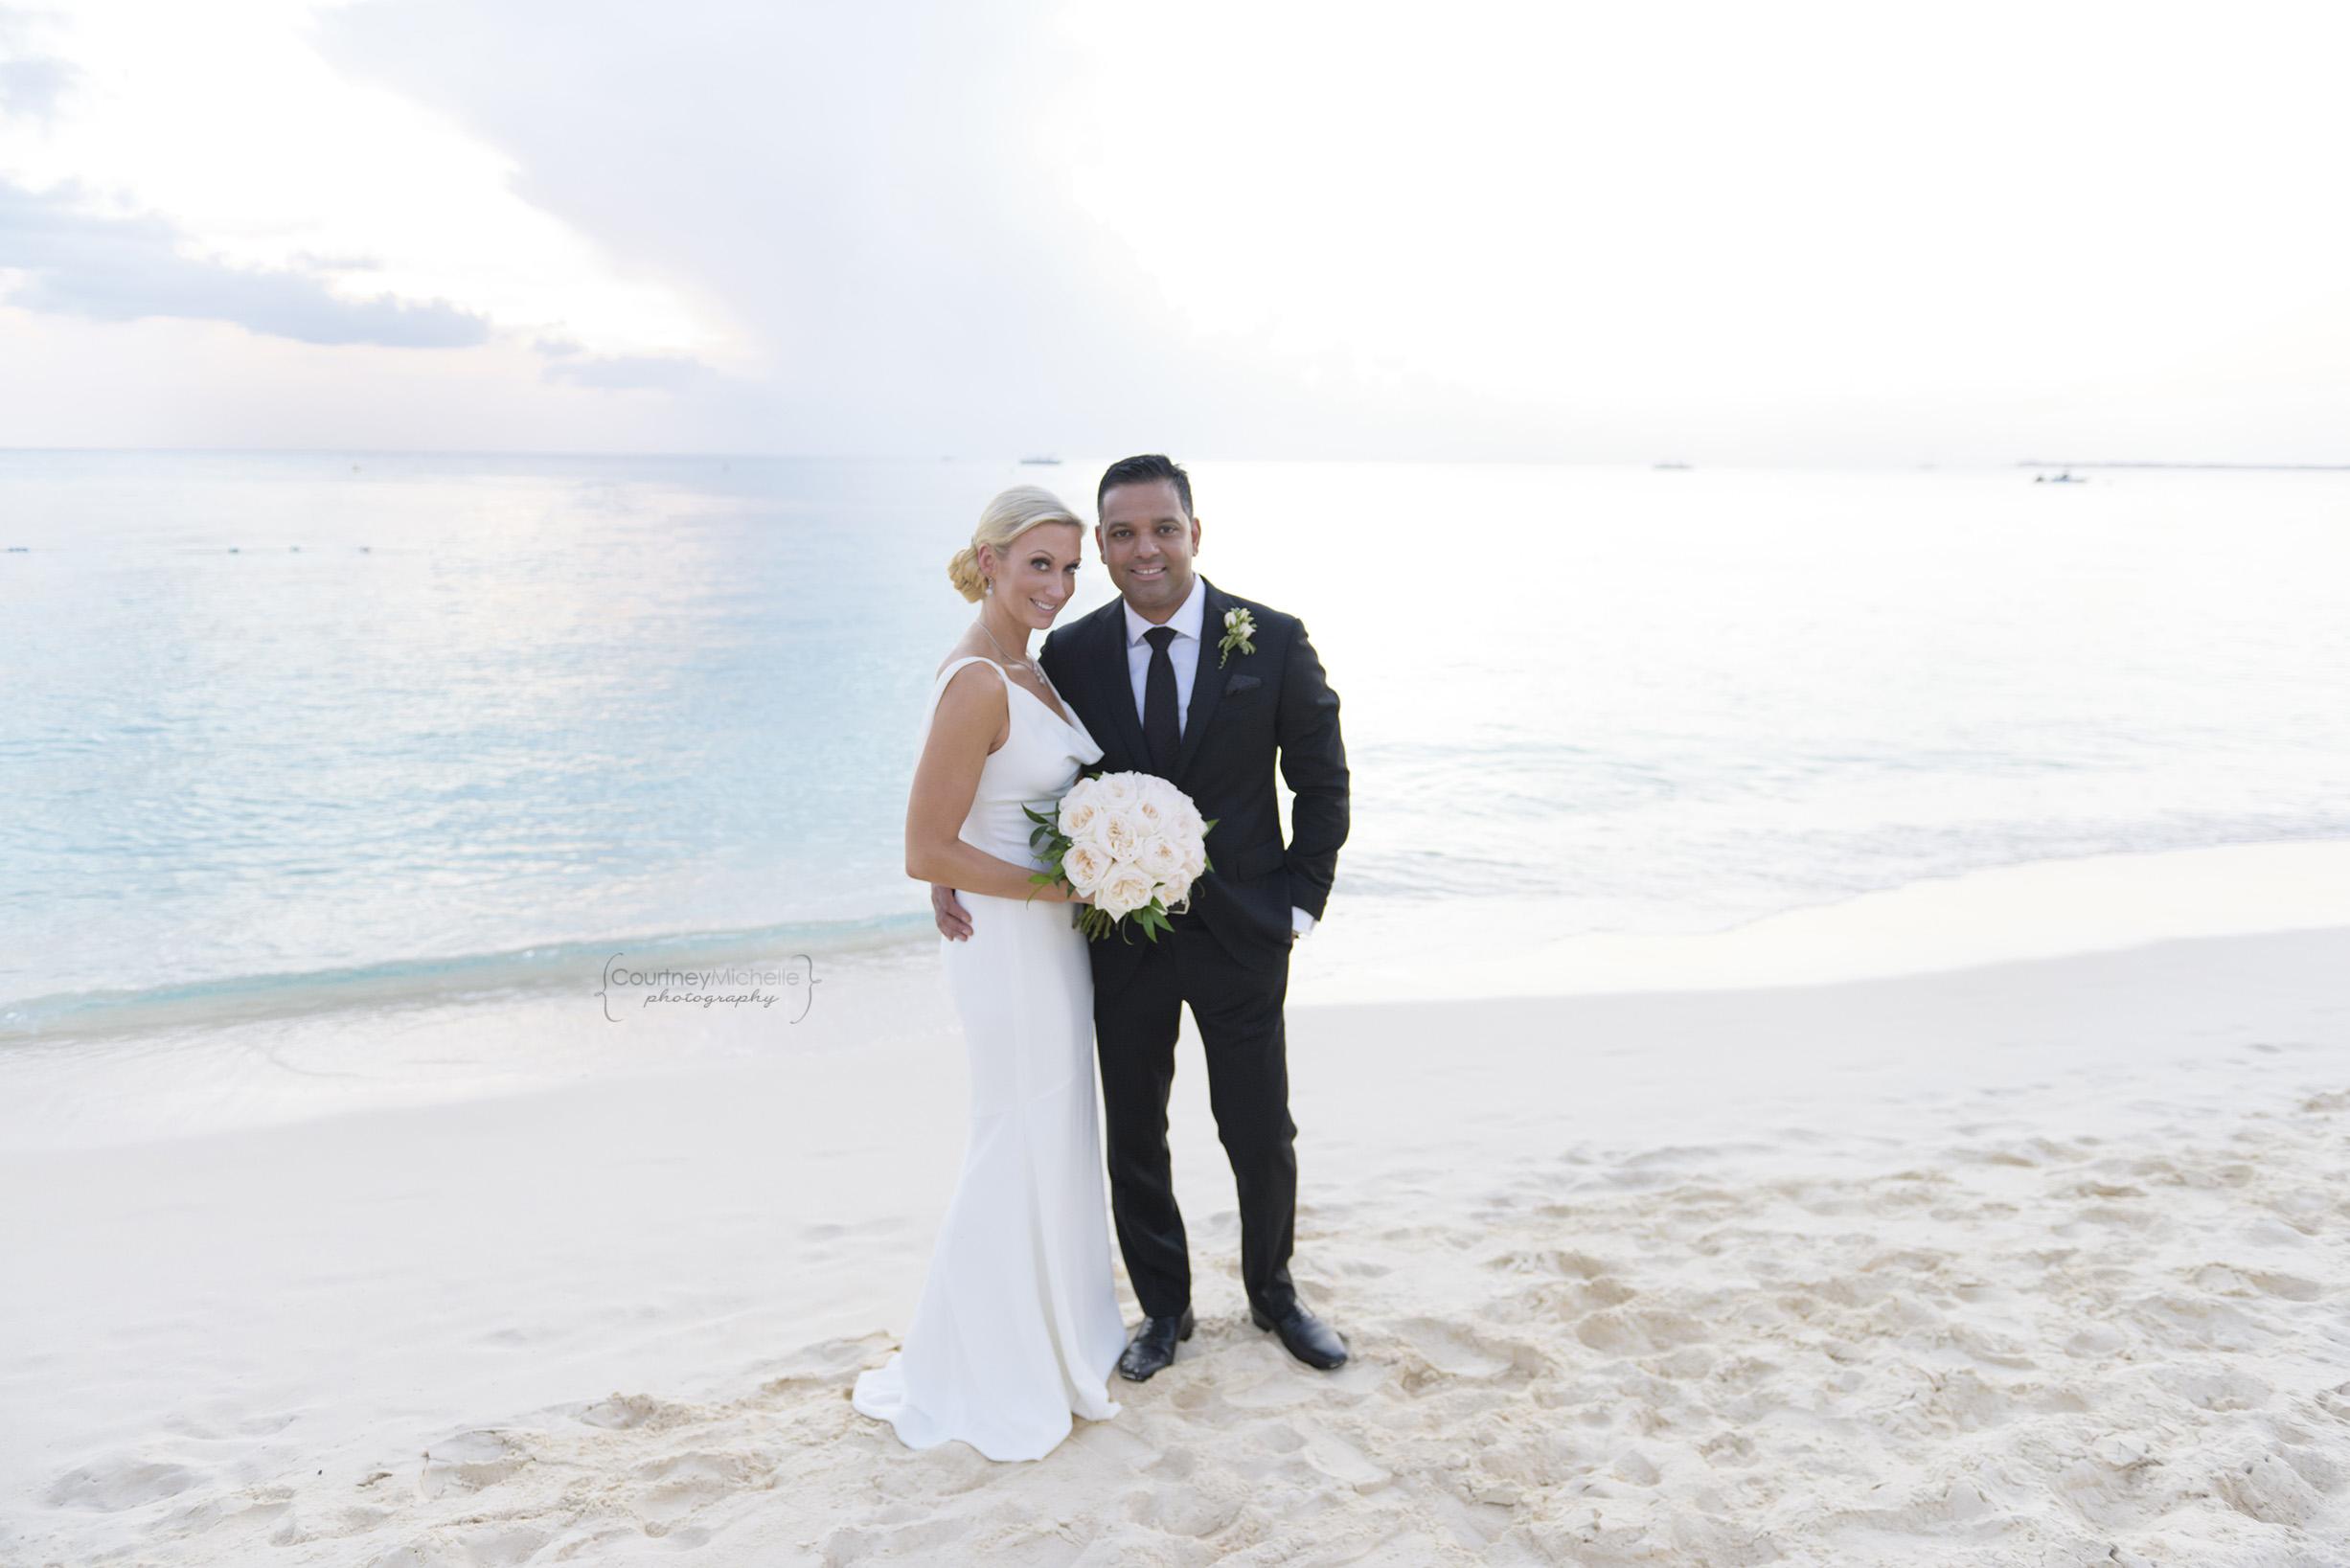 bride-and-groom-portrait-grand-cayman-beach-wedding-photography-by-courtney-laper©CopyrightCMP-LeaAnneRaj-7958.jpg